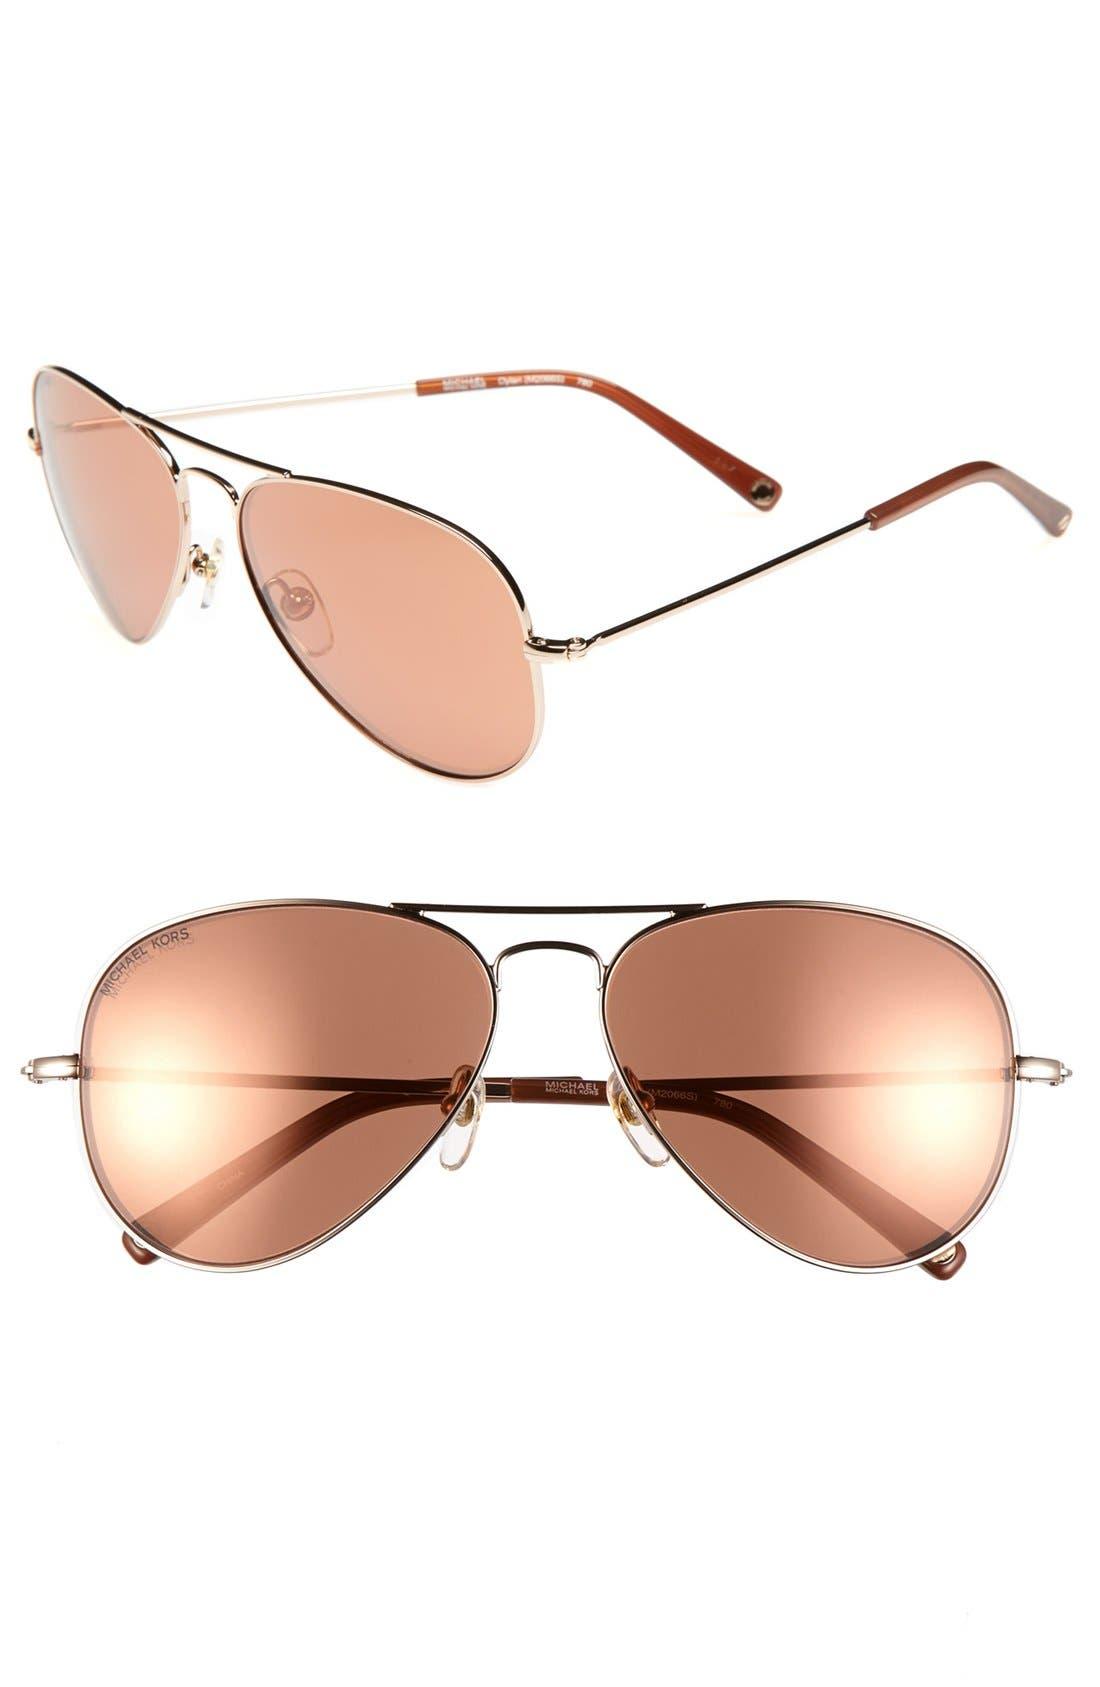 Main Image - MICHAEL Michael Kors 'Dylan' 58mm Aviator Sunglasses